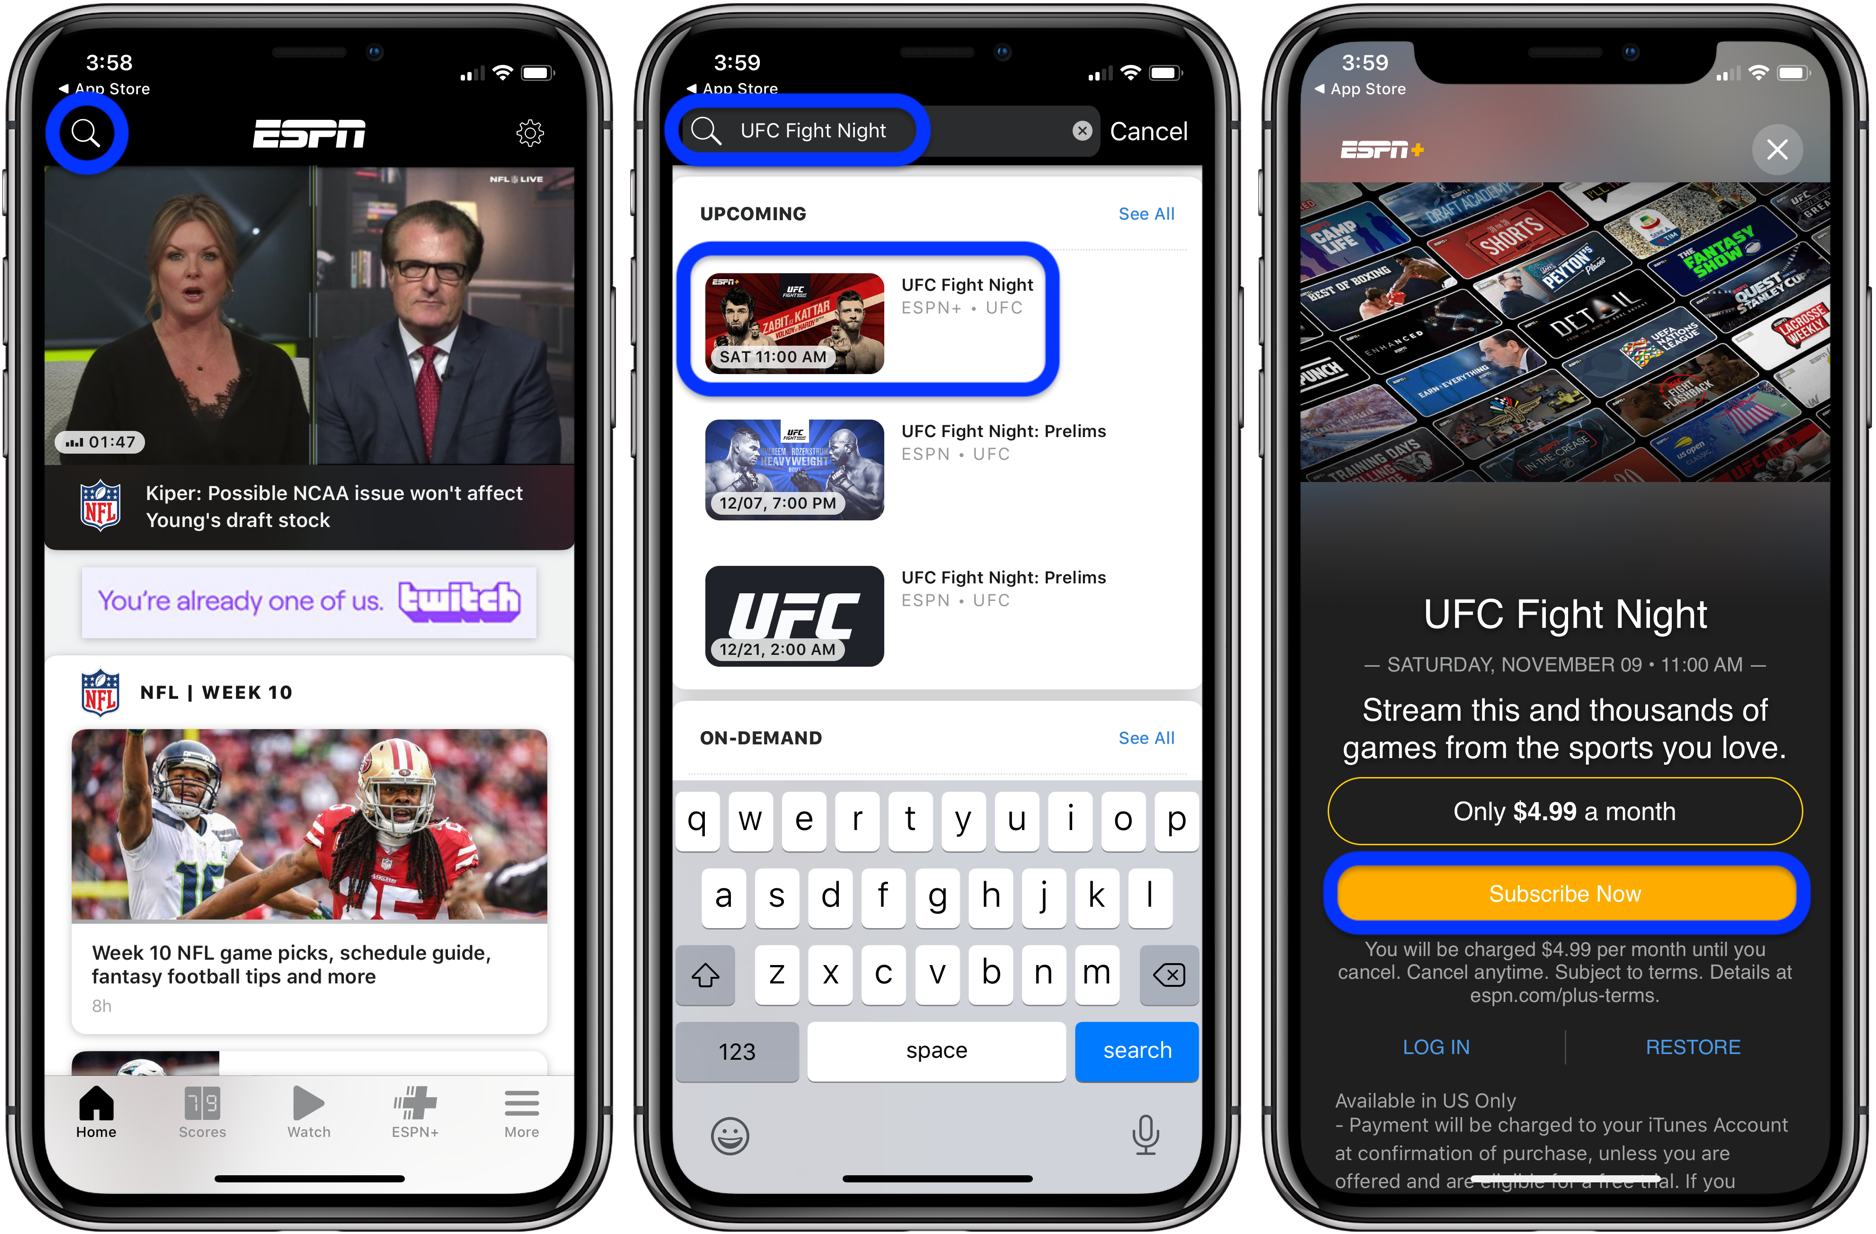 Как смотреть UFC Fight Night 163: Москва на iPhone, iPad и Apple TV